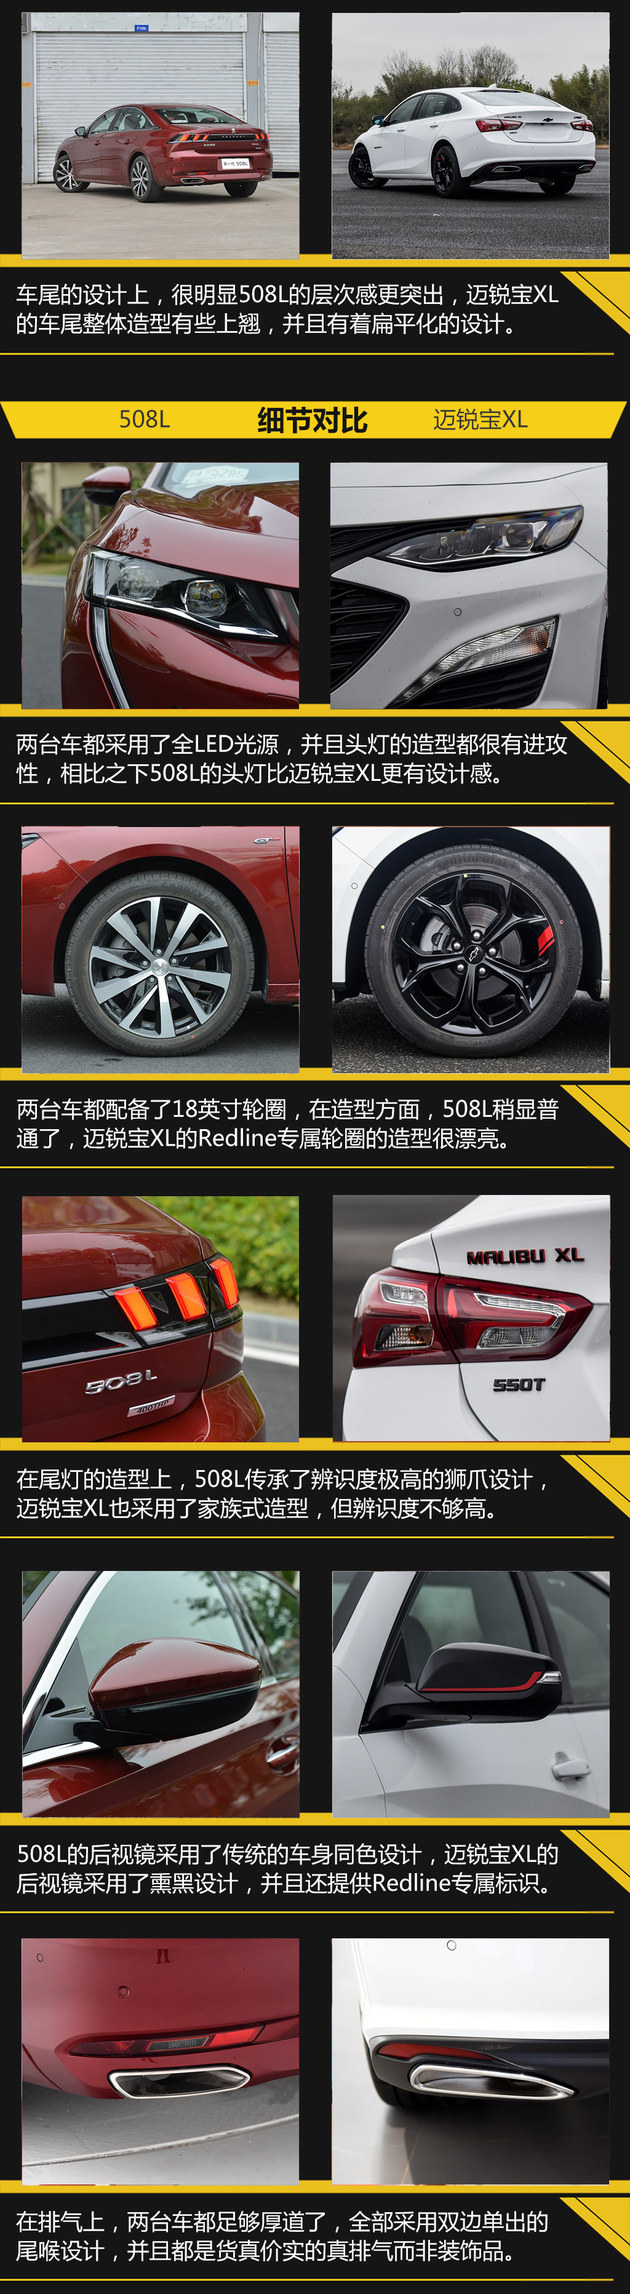 B级轿车个性之争 标致508L过招迈锐宝XL